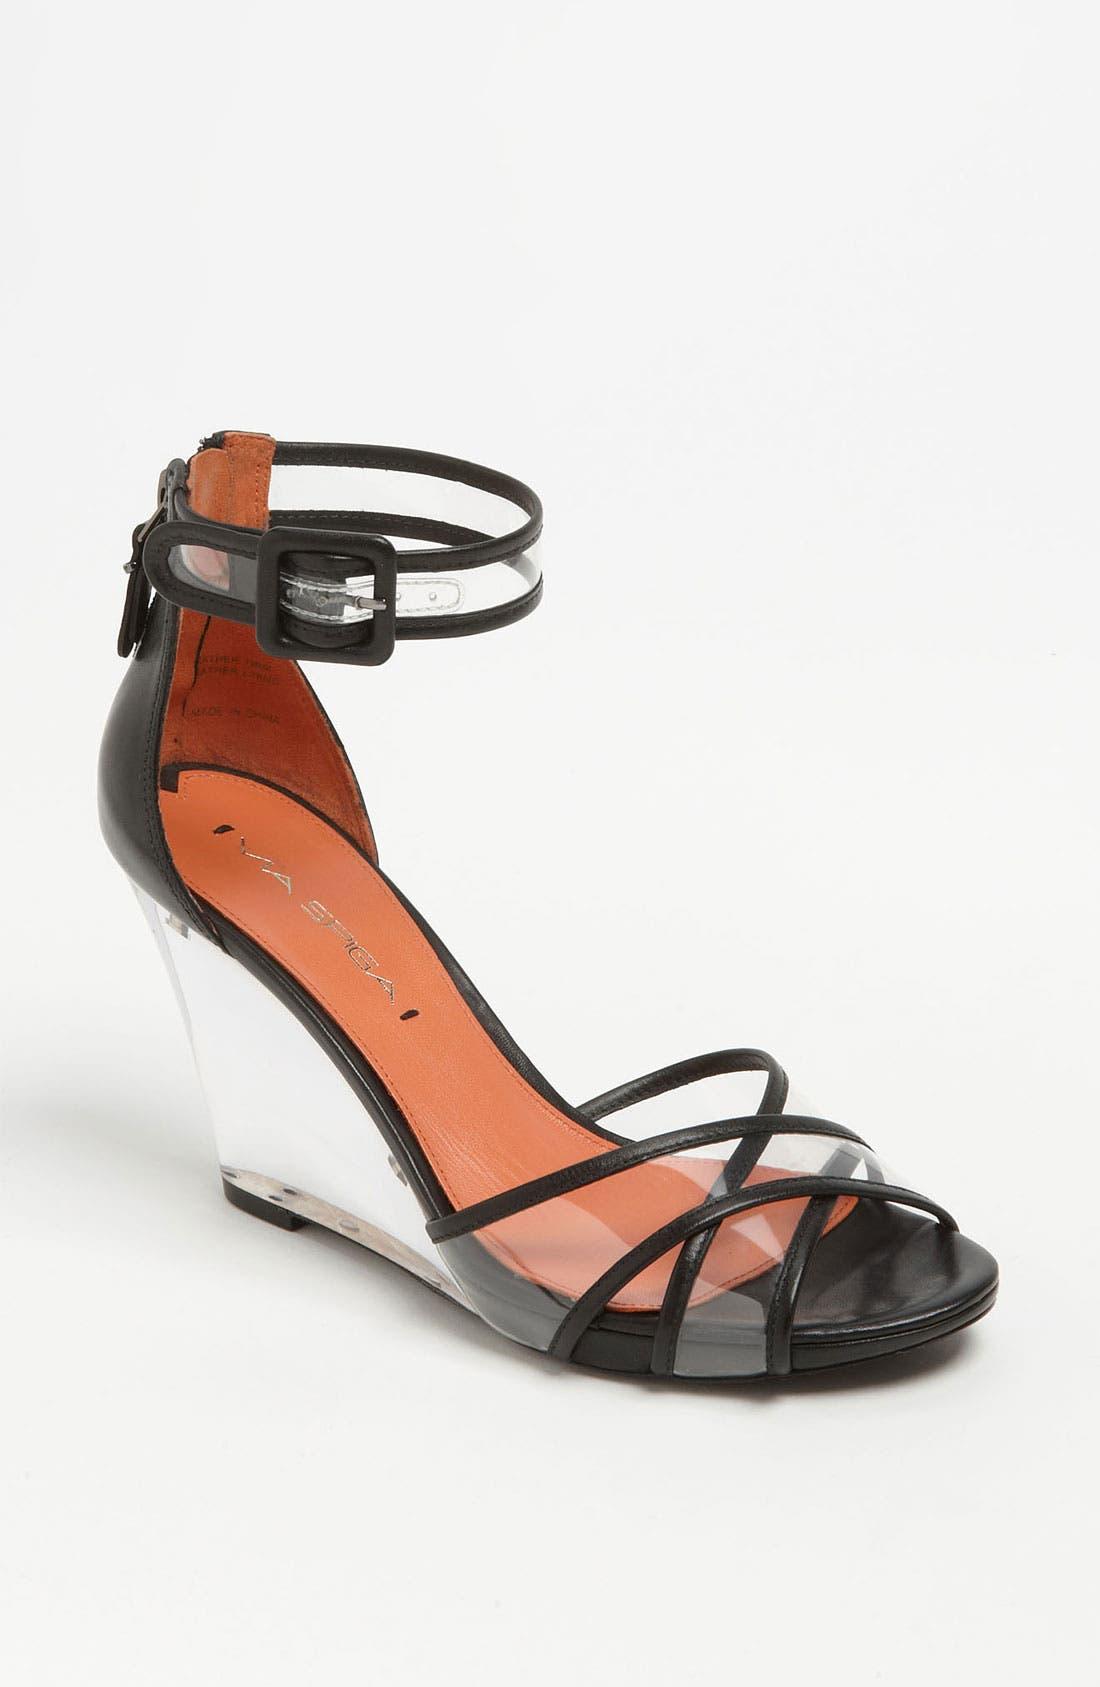 Main Image - Via Spiga 'Biana' Sandal